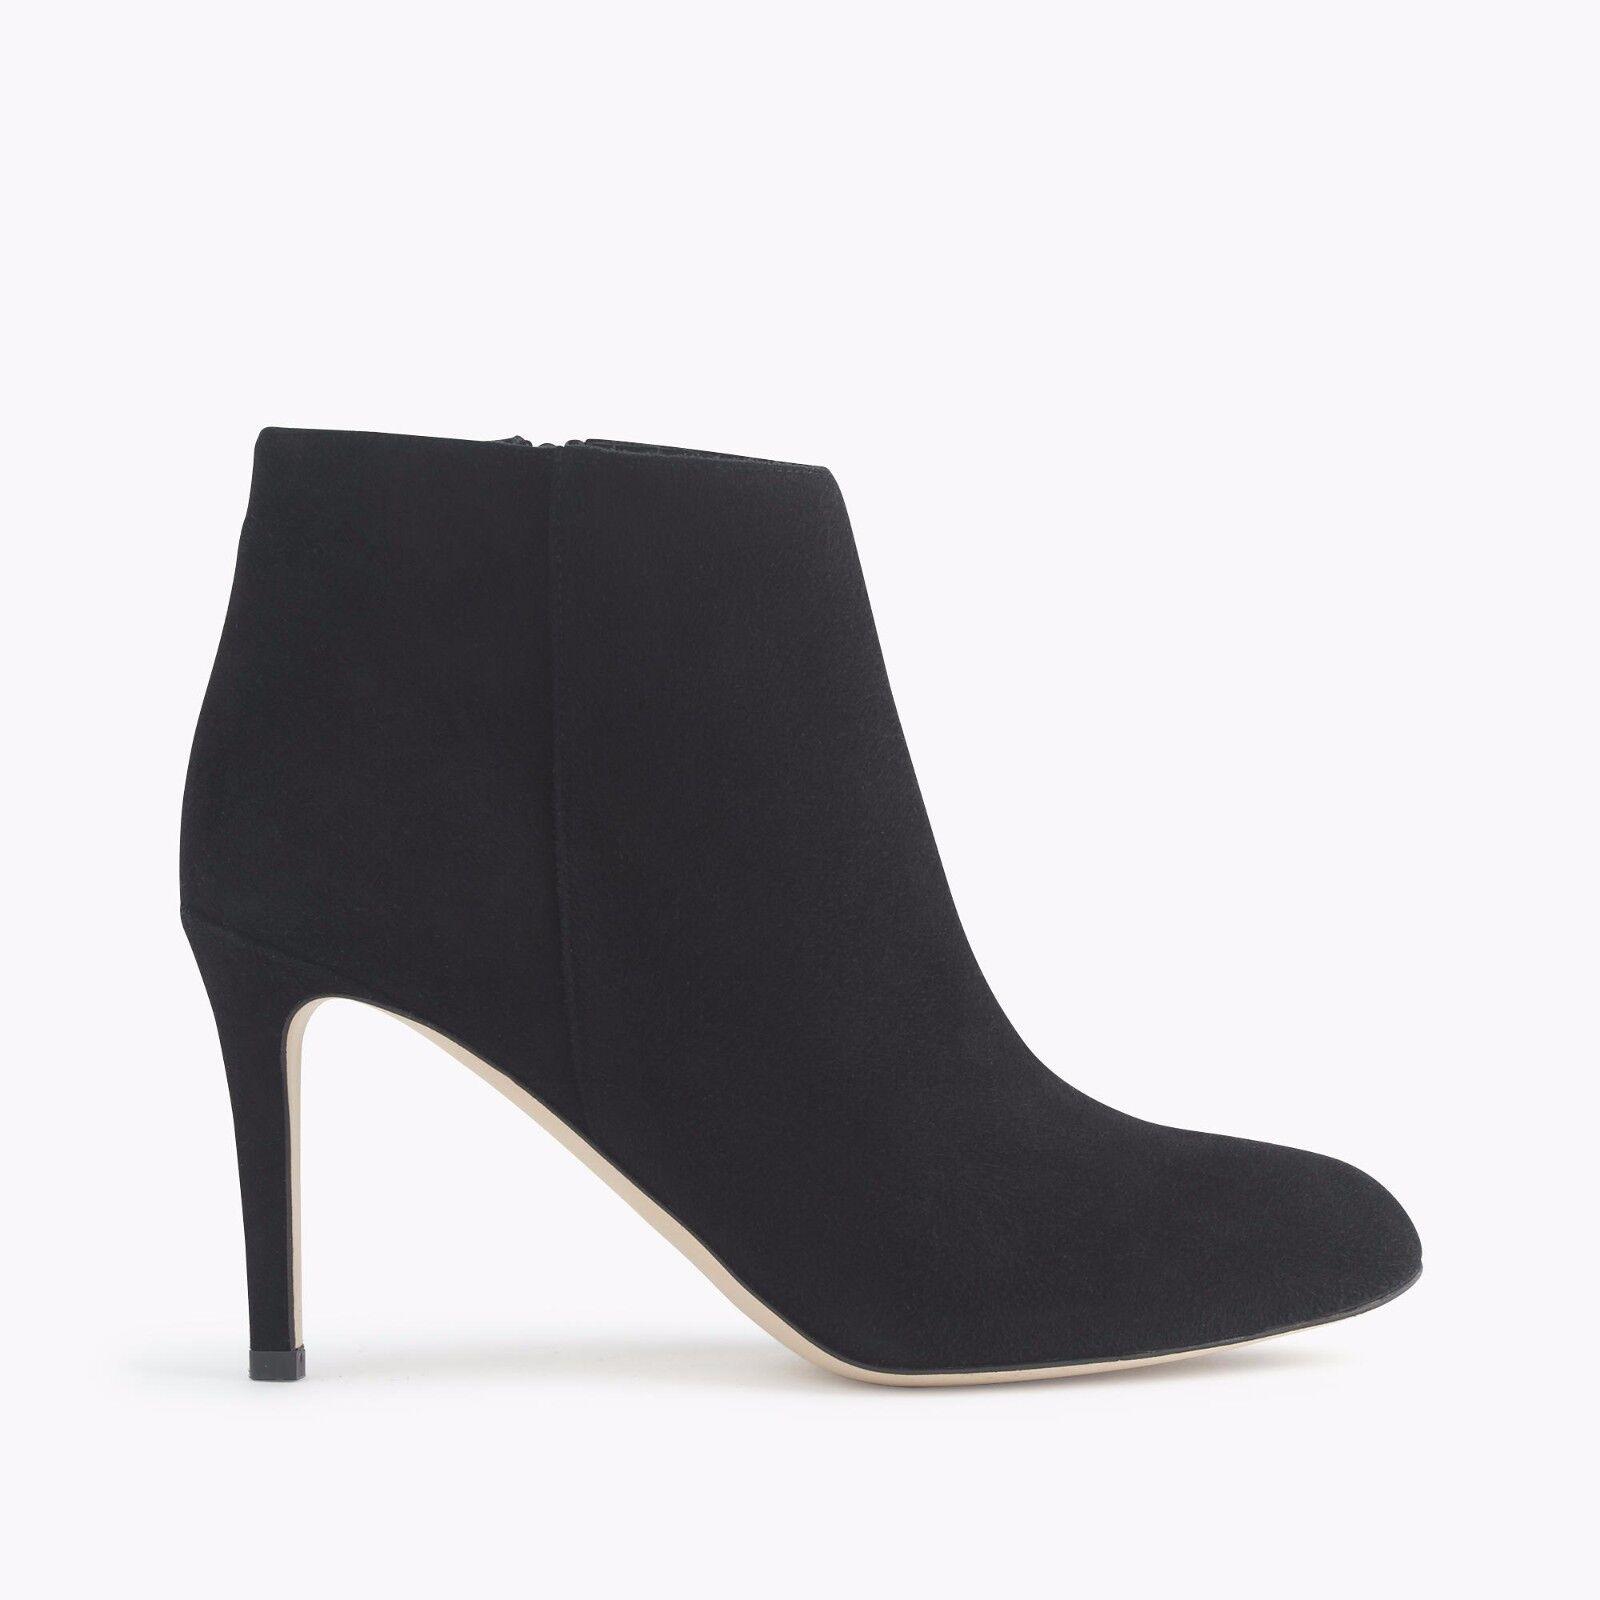 J.CREW Collection METROPOLITAN Black Suede ANKLE booties Heels SIZE 6.5